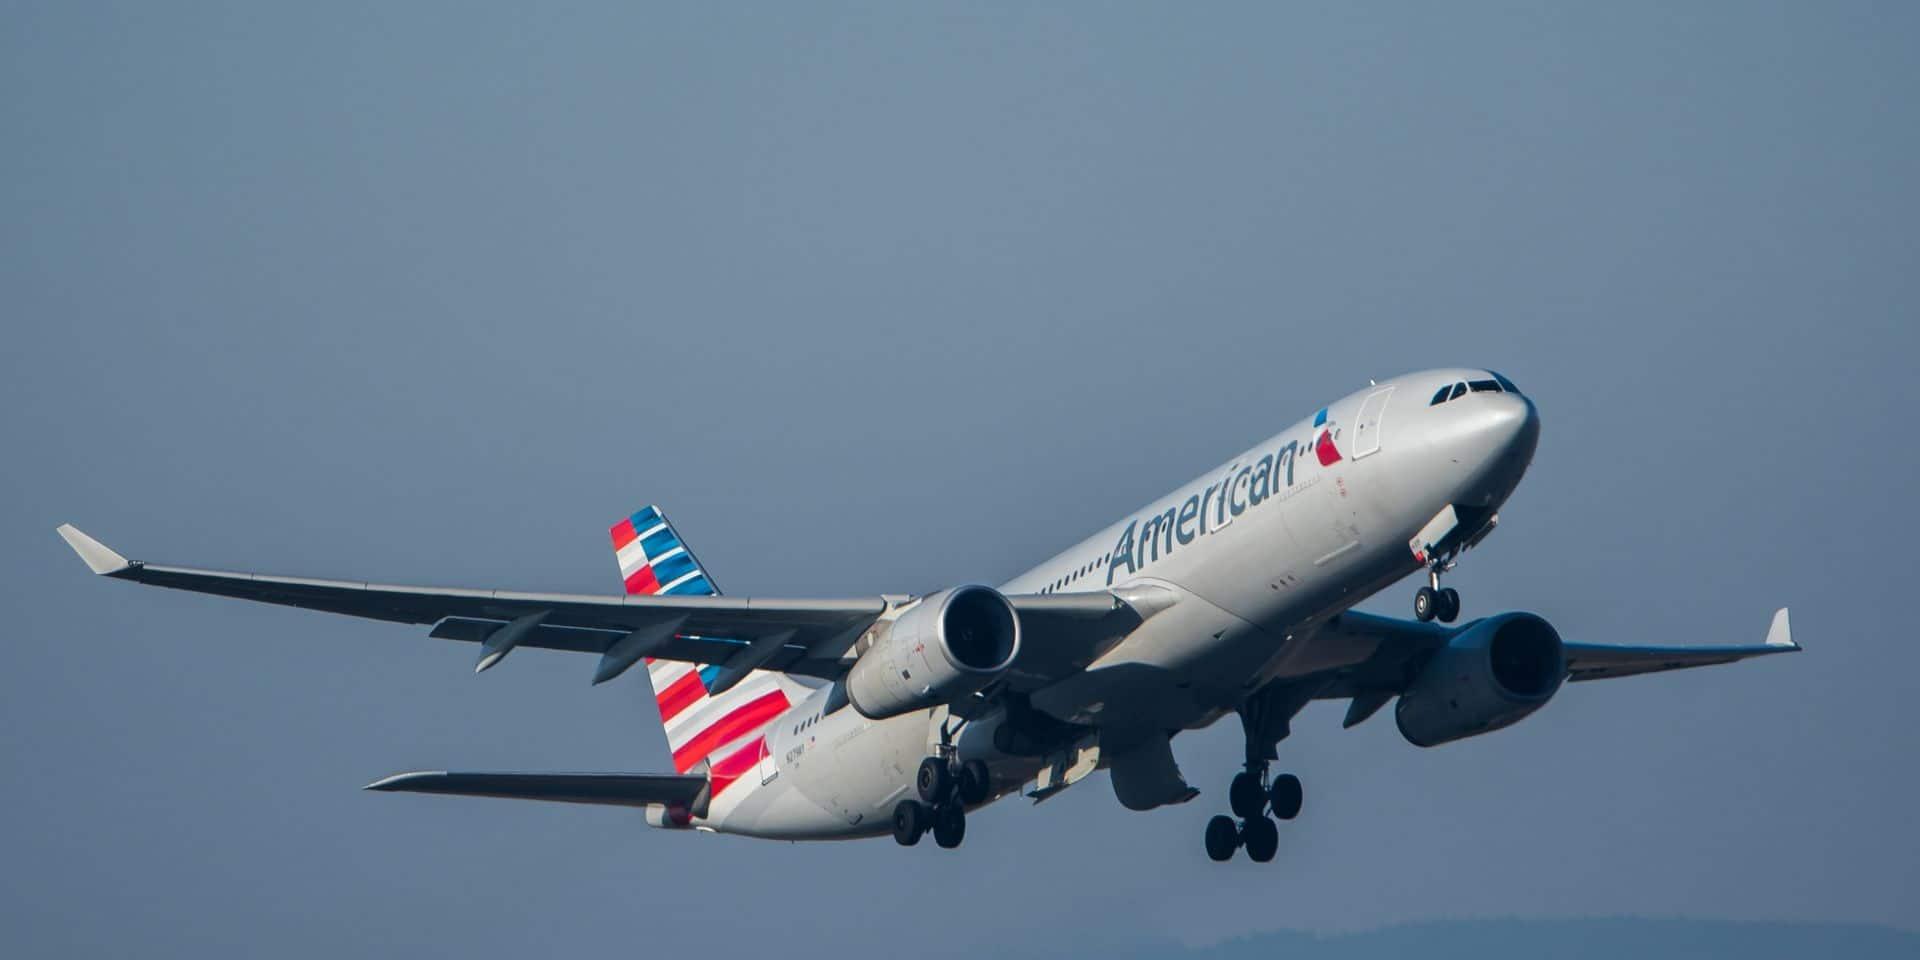 Coronavirus: la compagnie American Airlines commencera jeudi à licencier 19.000 salariés